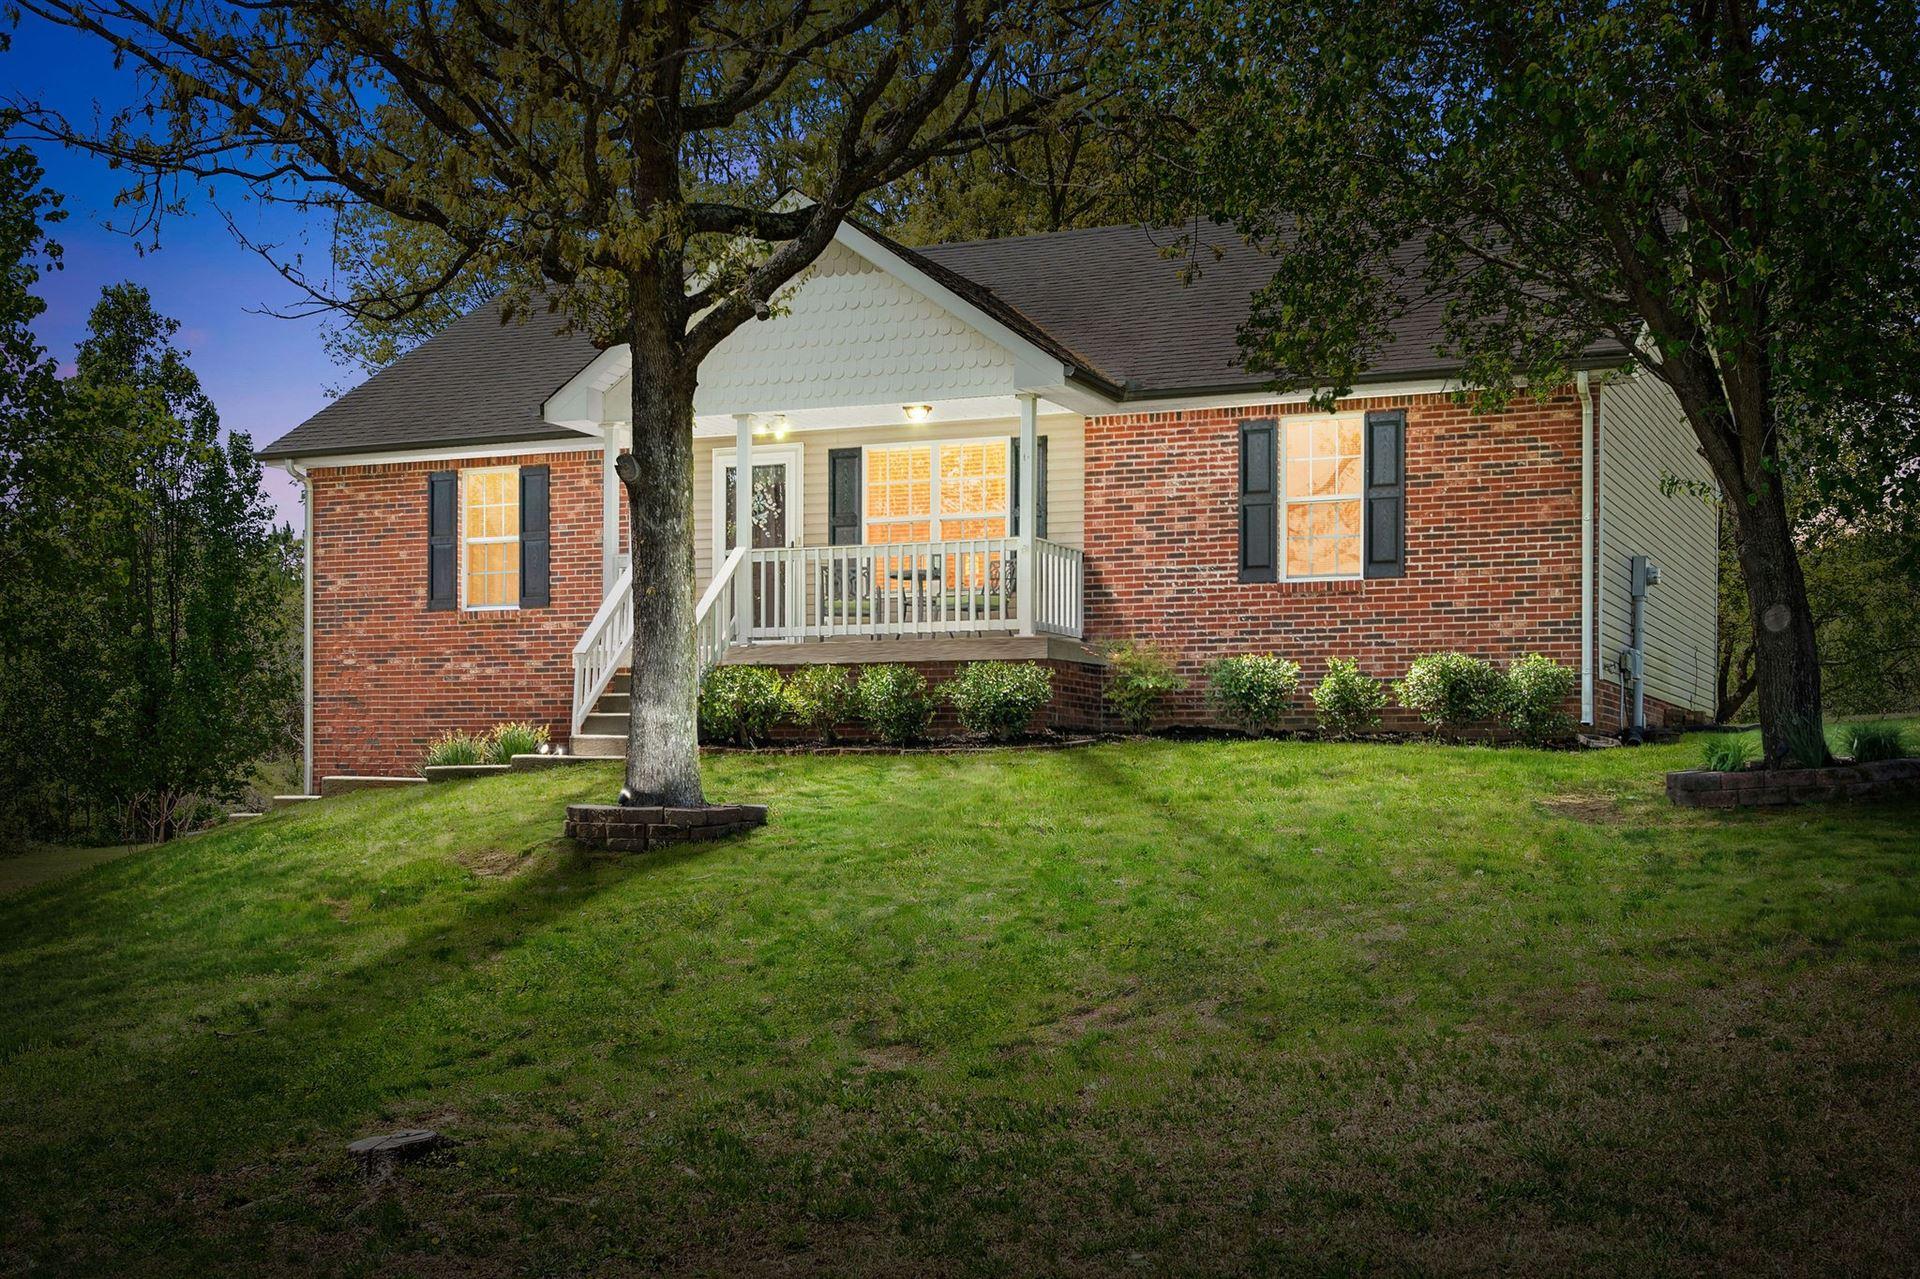 1934 Roscoe Drive, Clarksville, TN 37042 - MLS#: 2246783